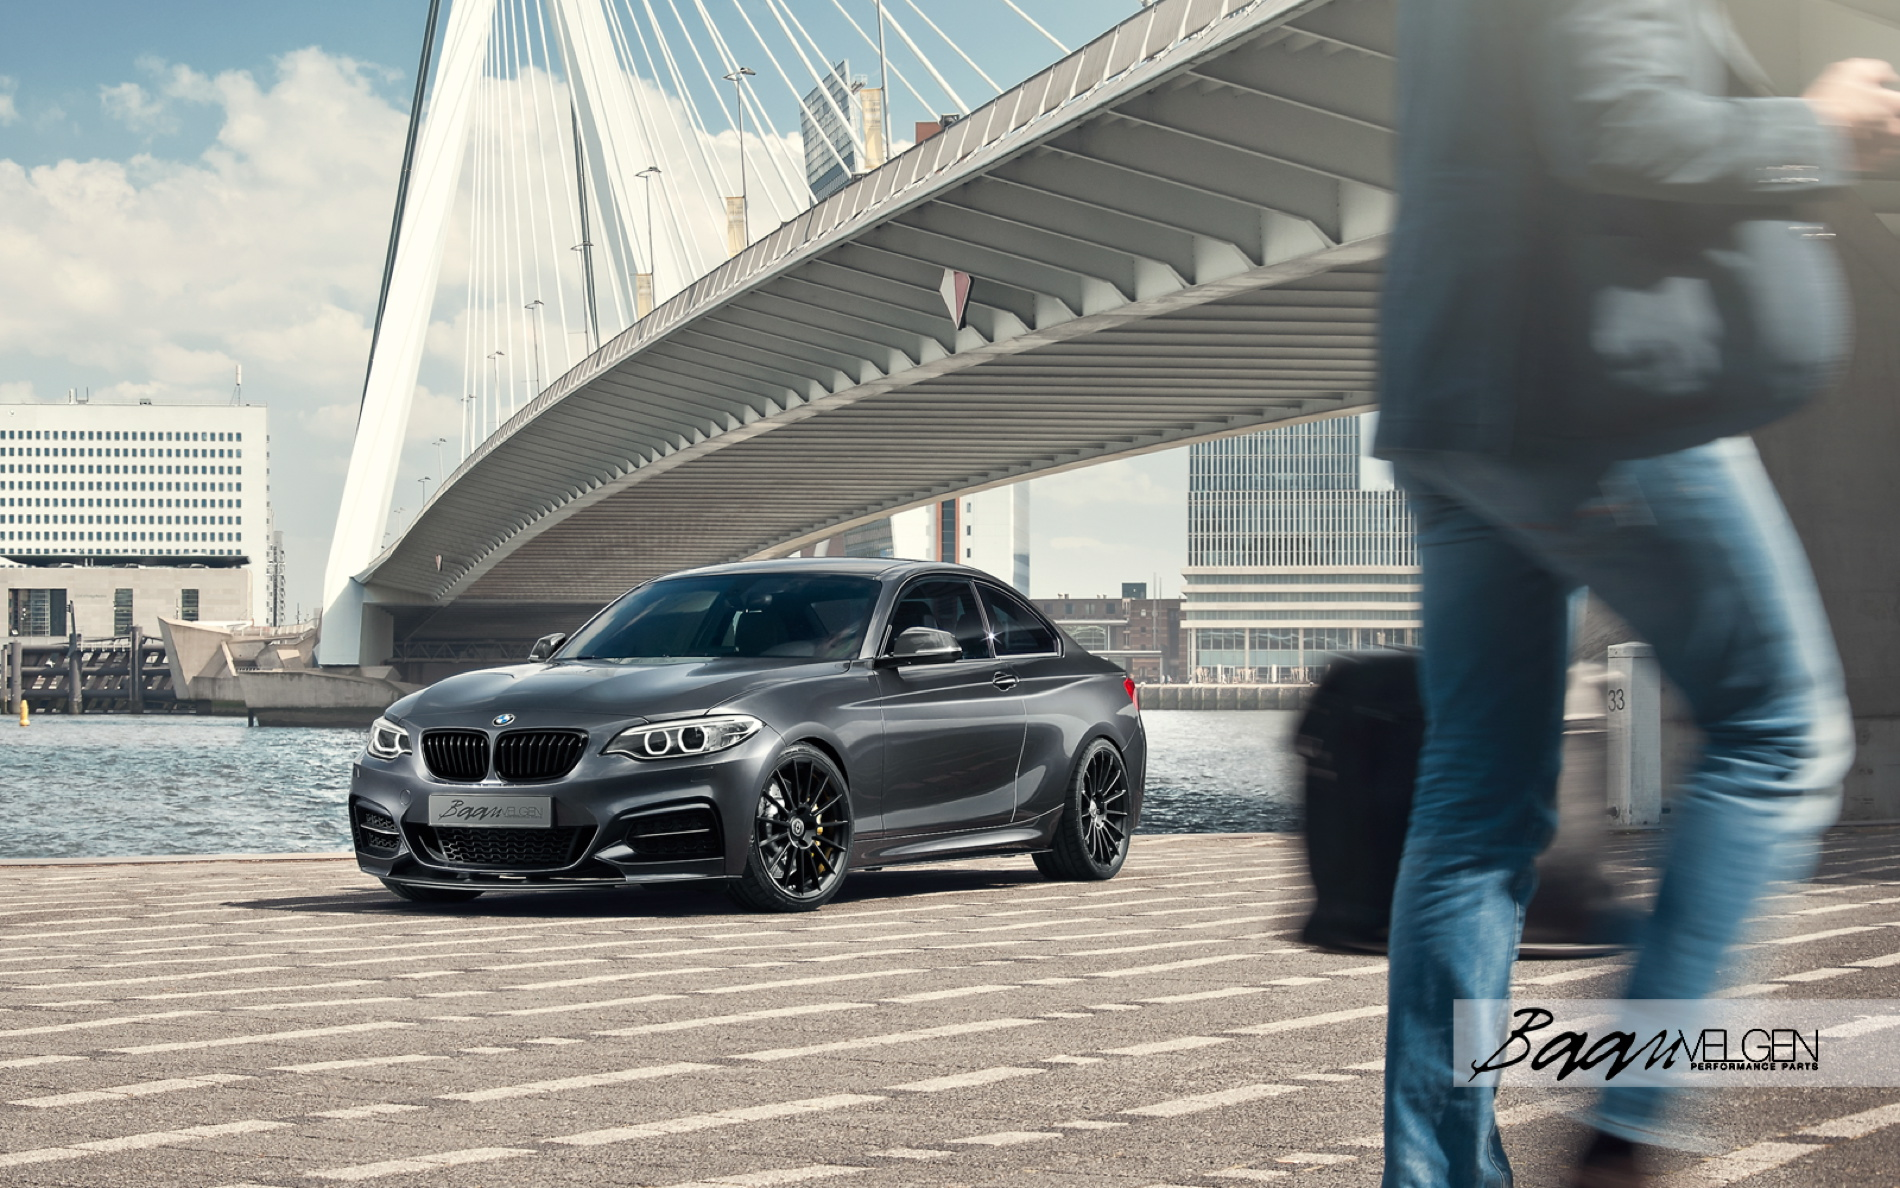 BMW M235i Track Edition images 01